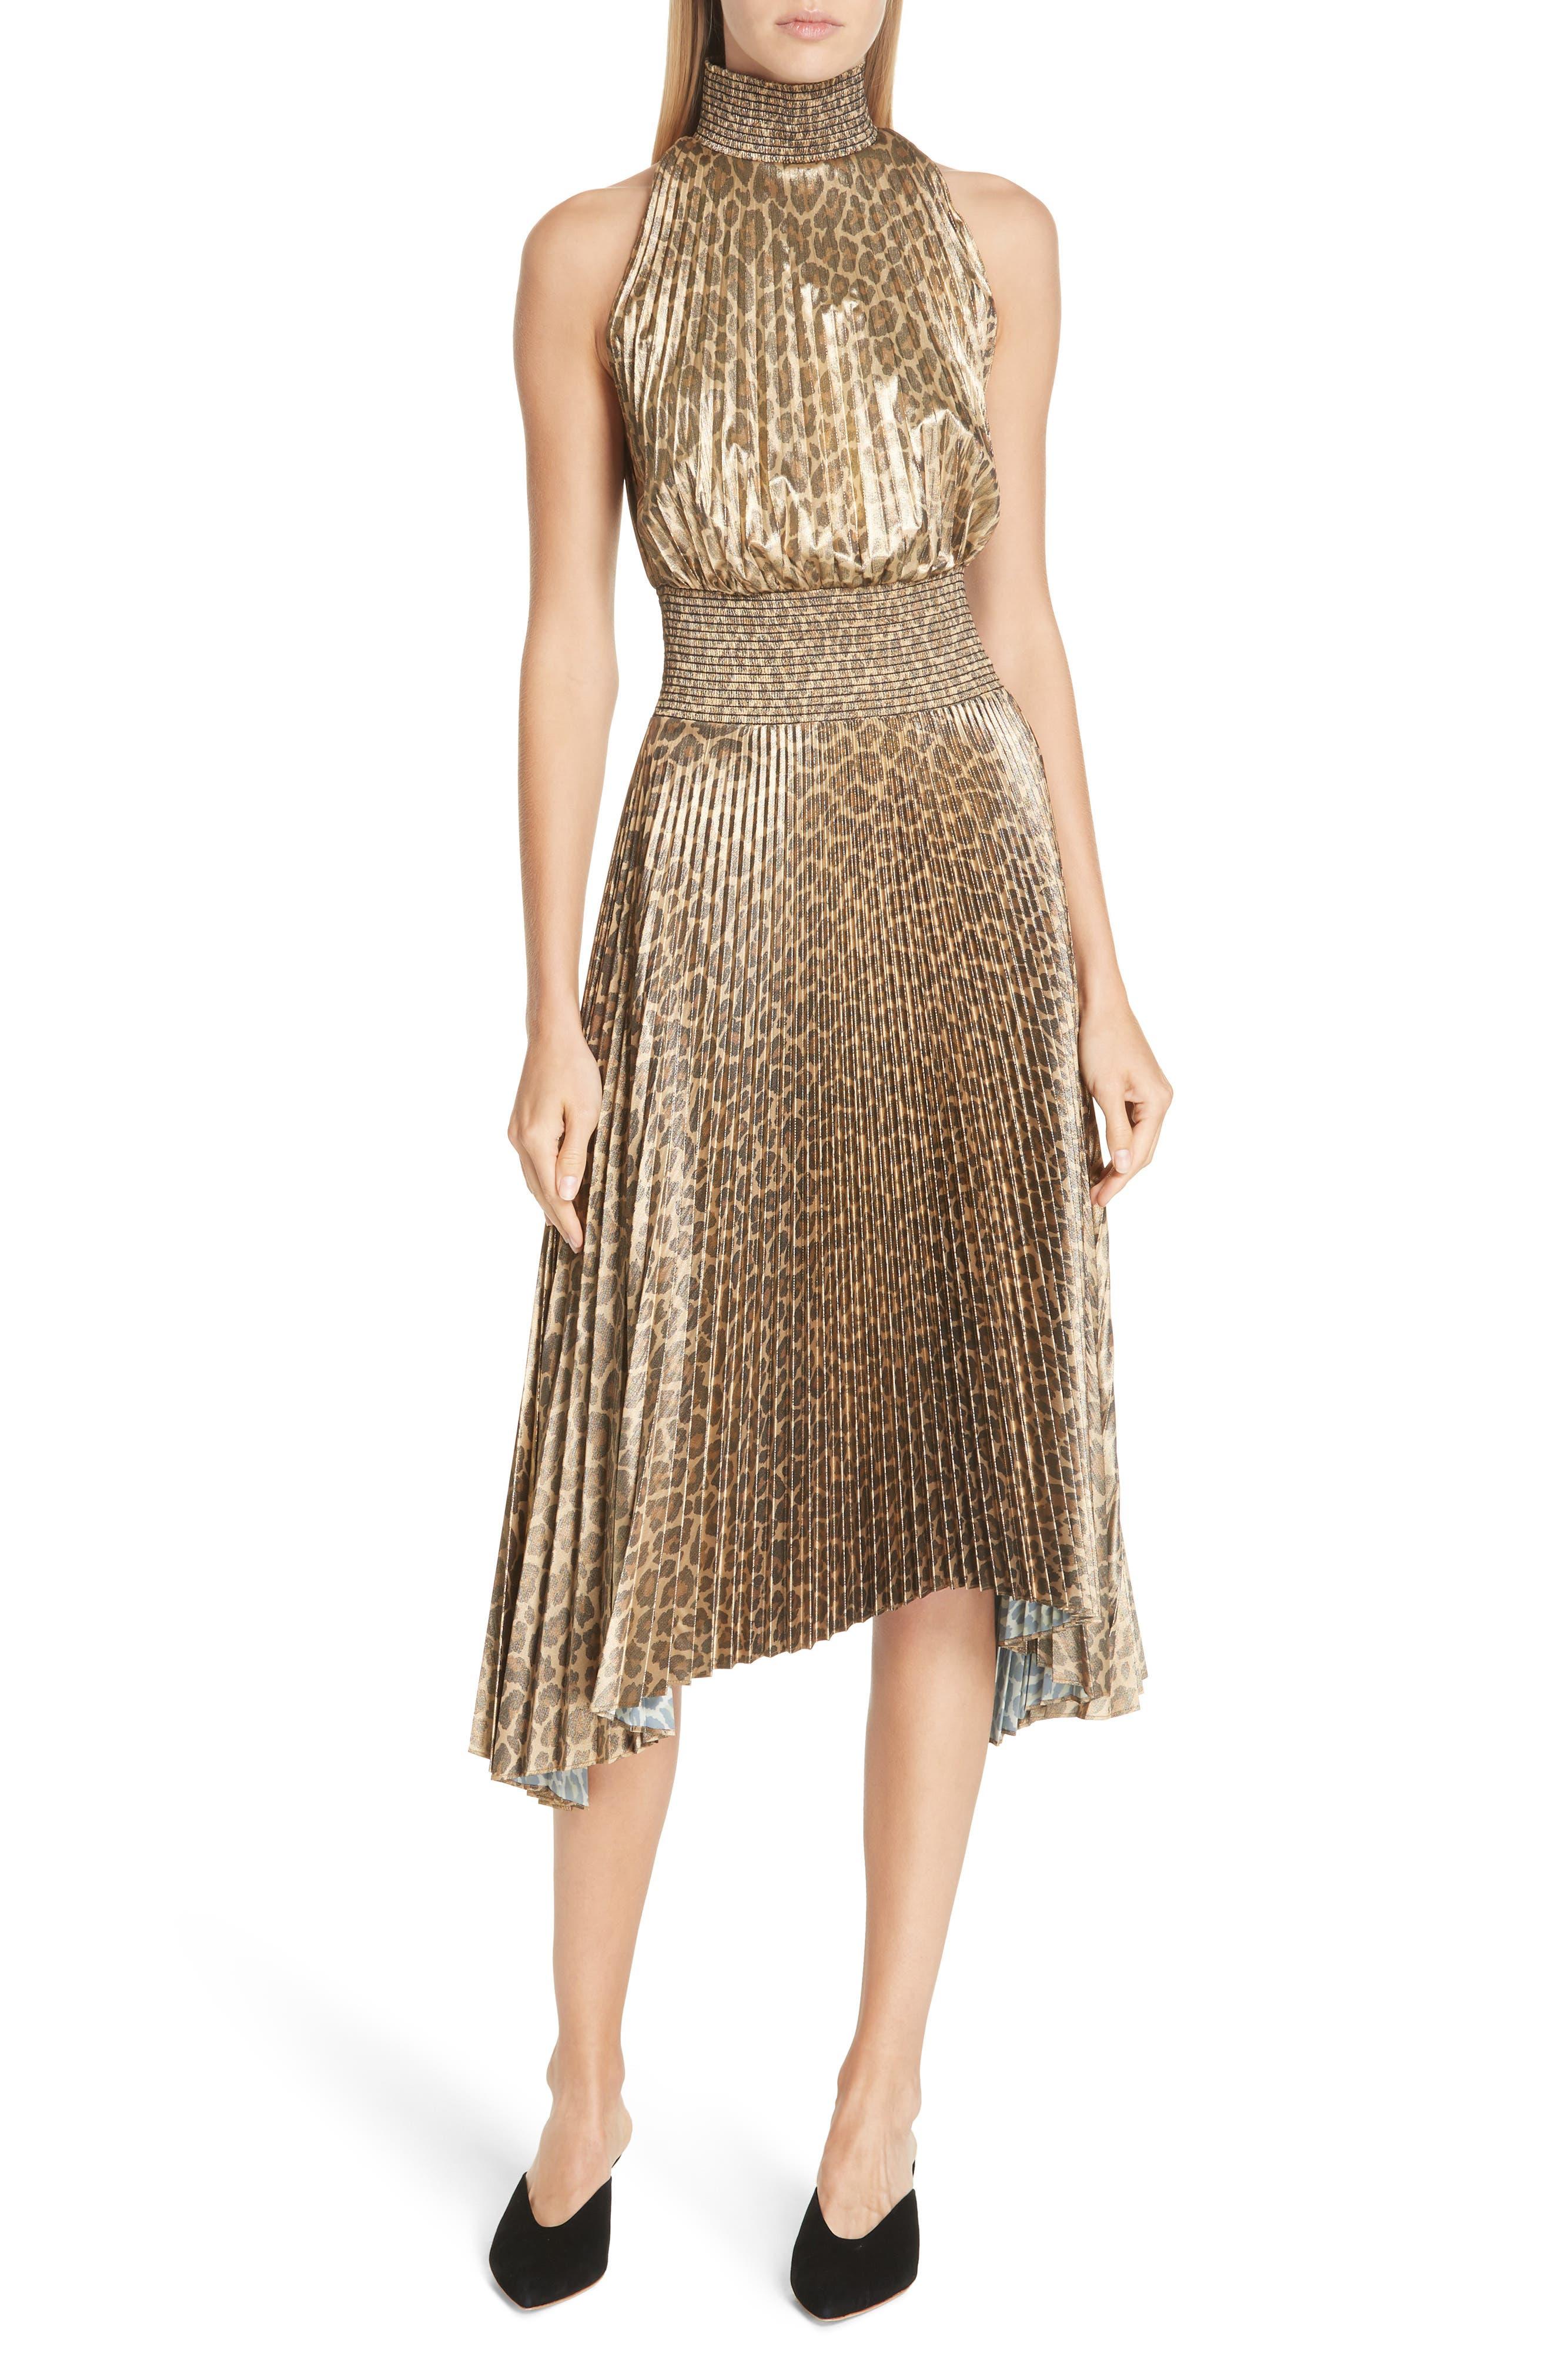 Renzo Leopard Print Metallic Foil Dress,                             Main thumbnail 1, color,                             METALLIC GOLD